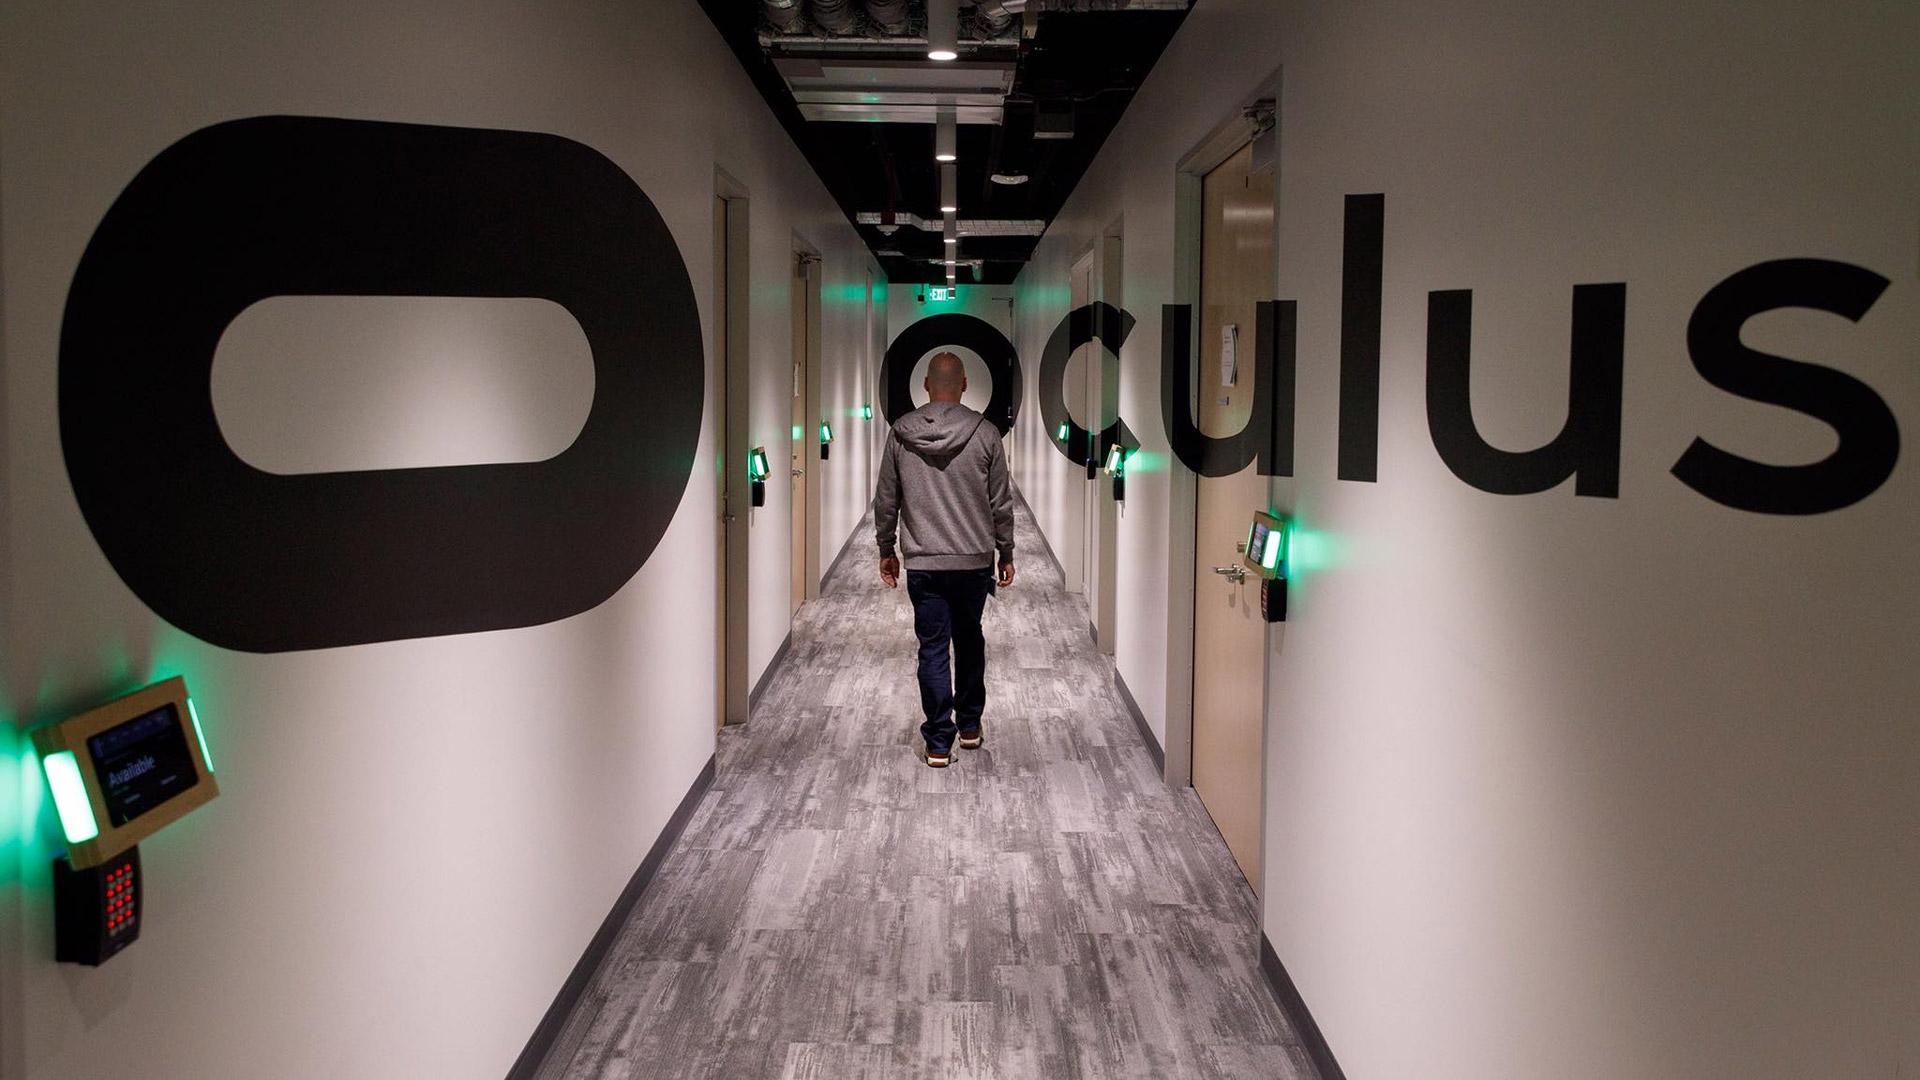 Facebook Shuffles Top Oculus Executives – Road to VR